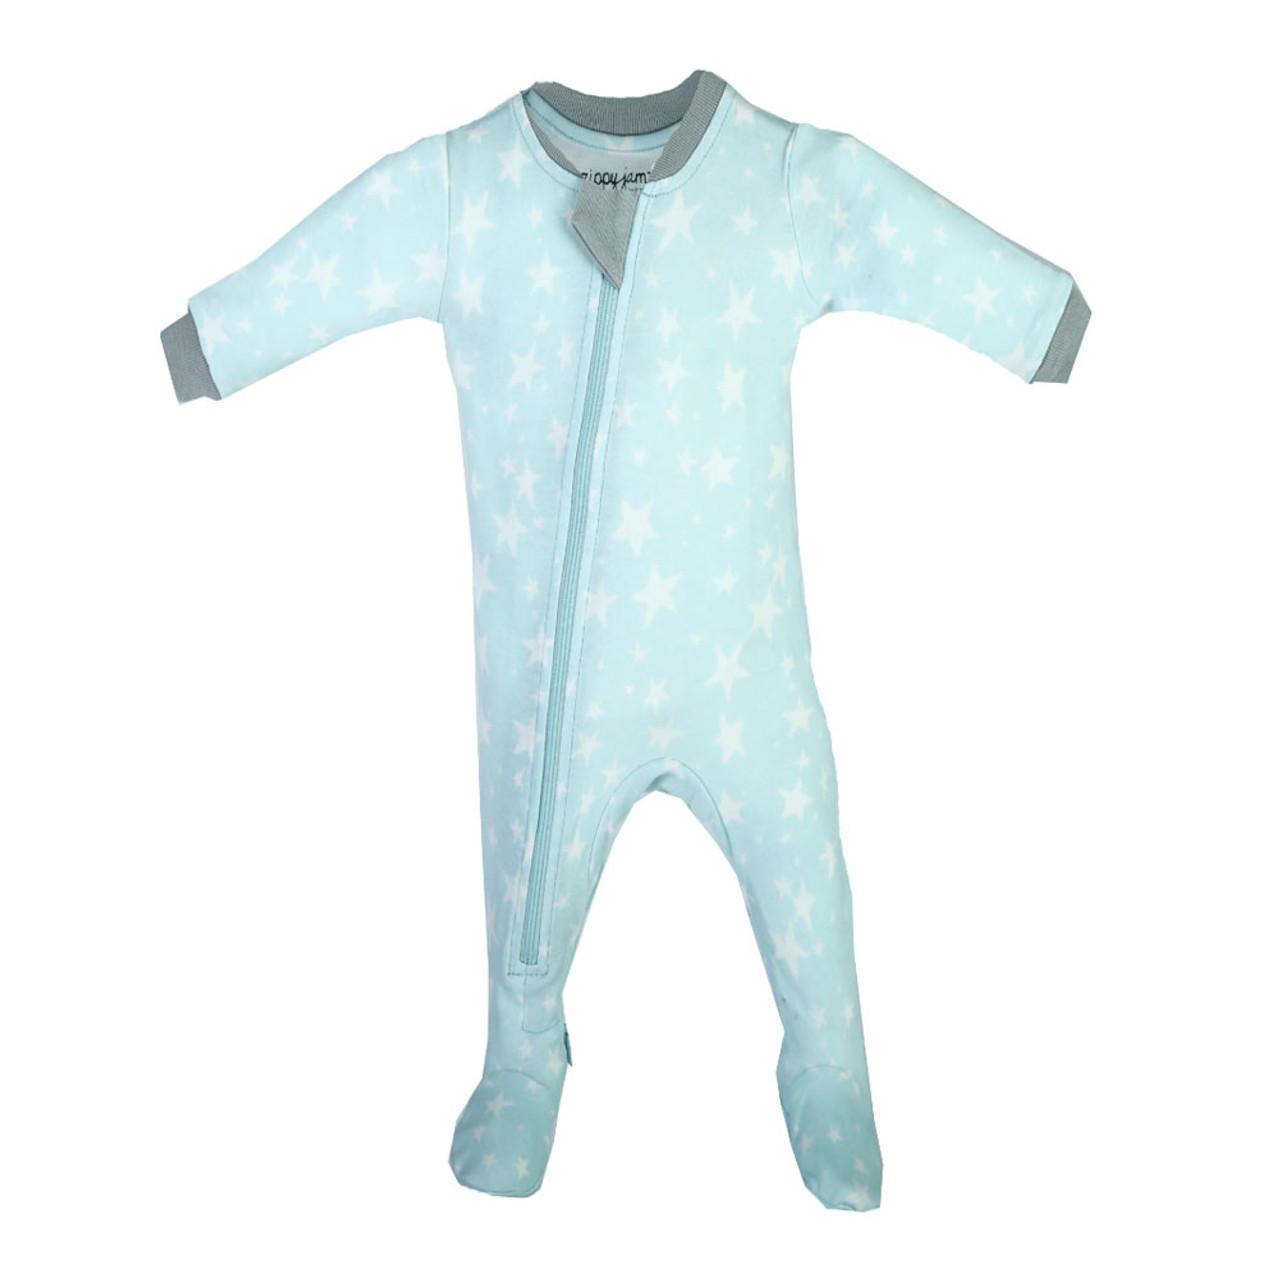 a2366ac4b Zippy Jamz Organic Cotton Footed Sleeper - Slumber Star (3-6 Months ...